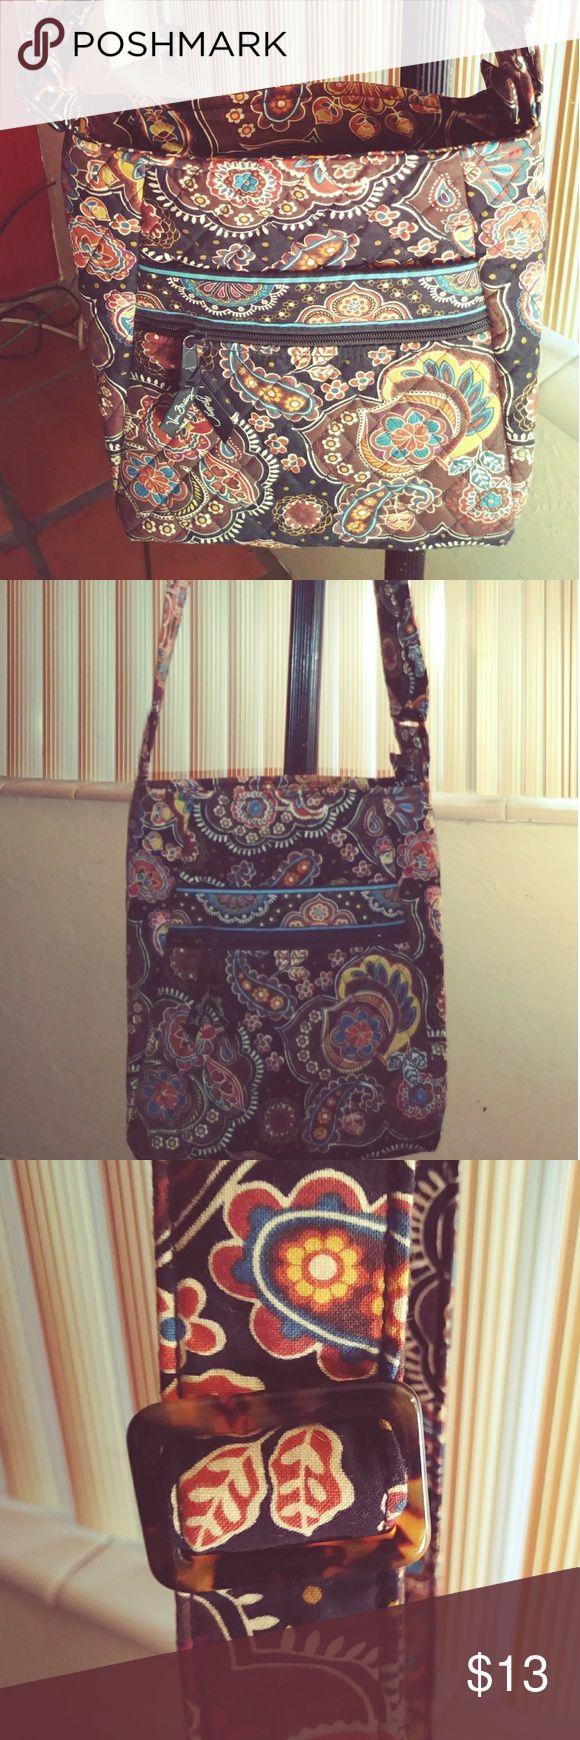 Vera Bradley Crossbody Purse Bag Browns, teal, black floral paisley. Like new, clean, never used. Vera Bradley Bags Crossbody Bags